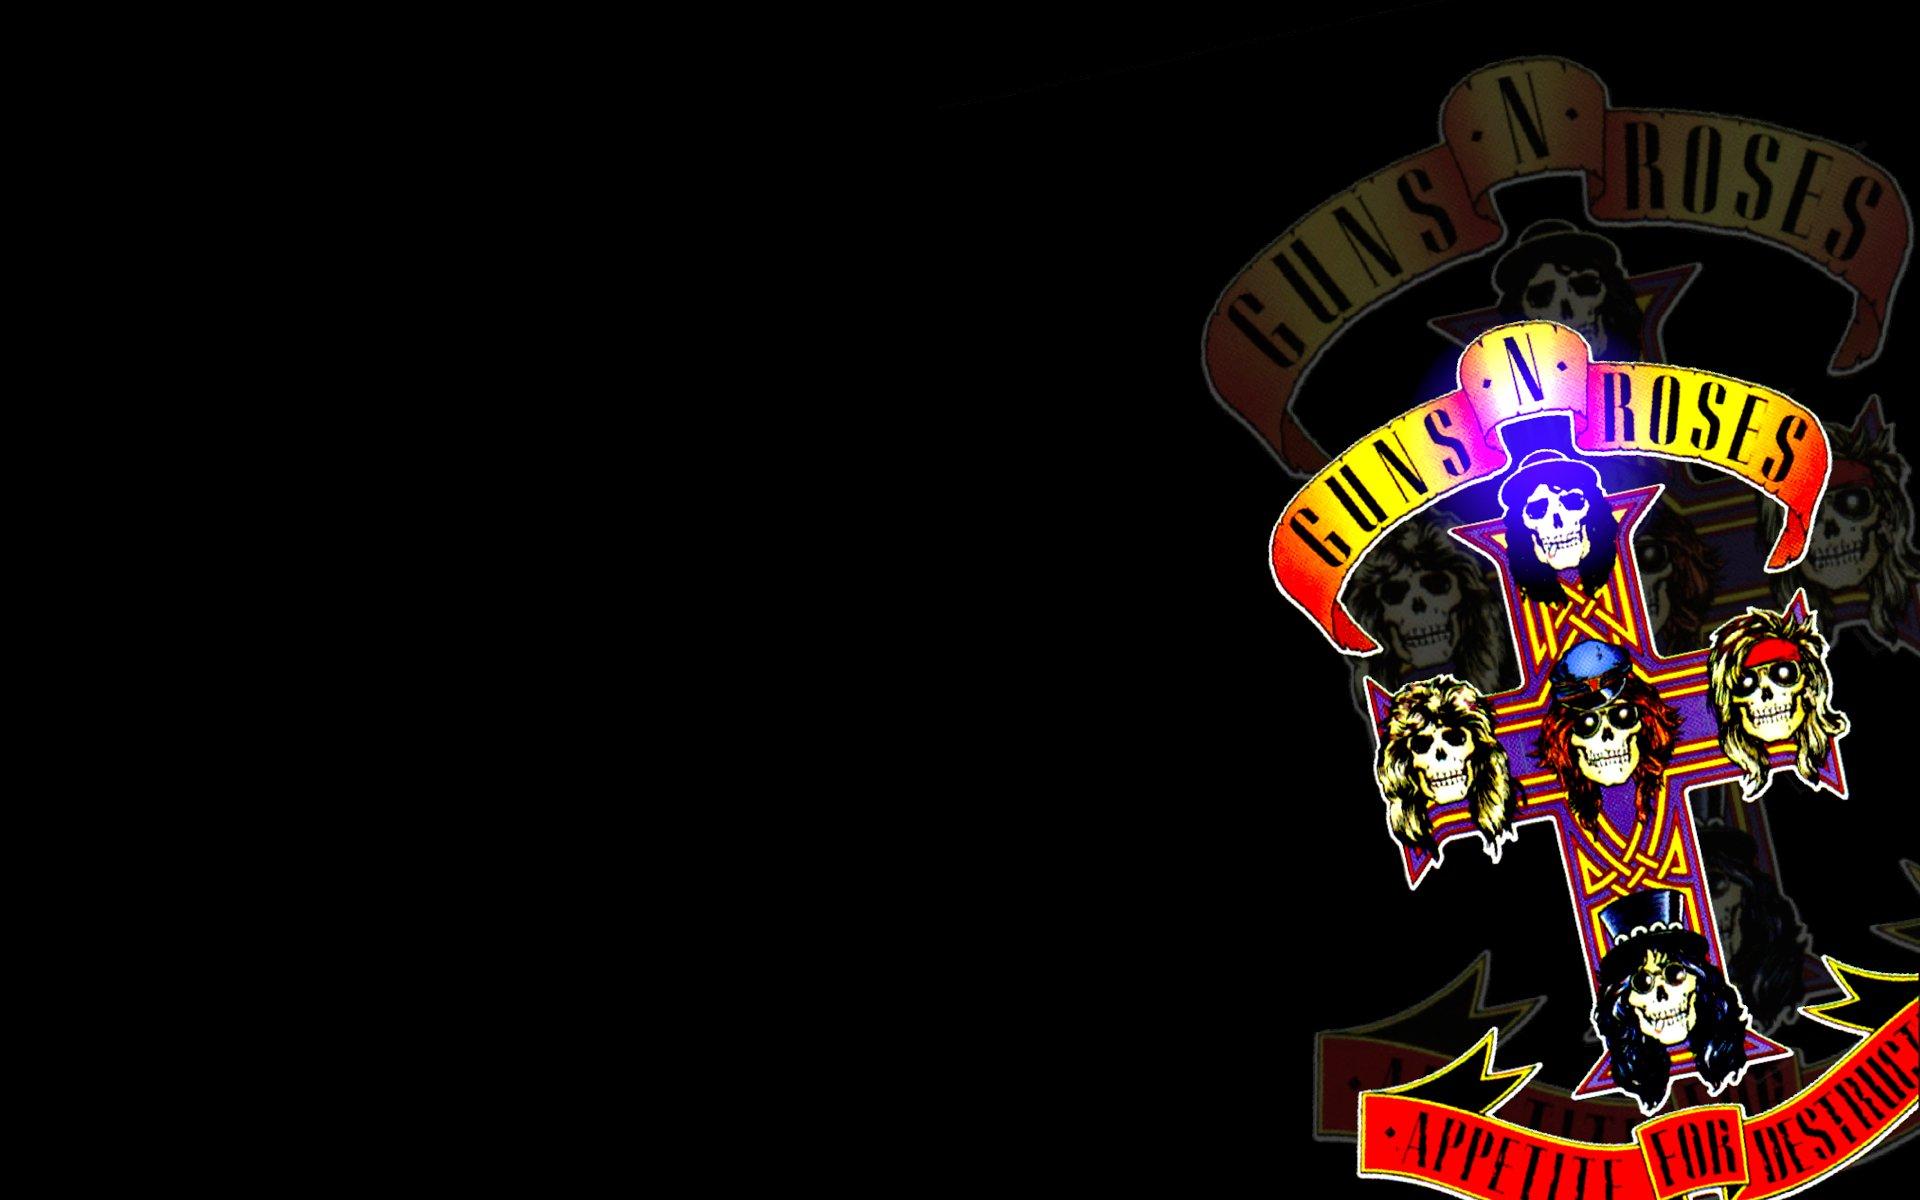 Guns N Roses Hd Wallpaper Background Image 1920x1200